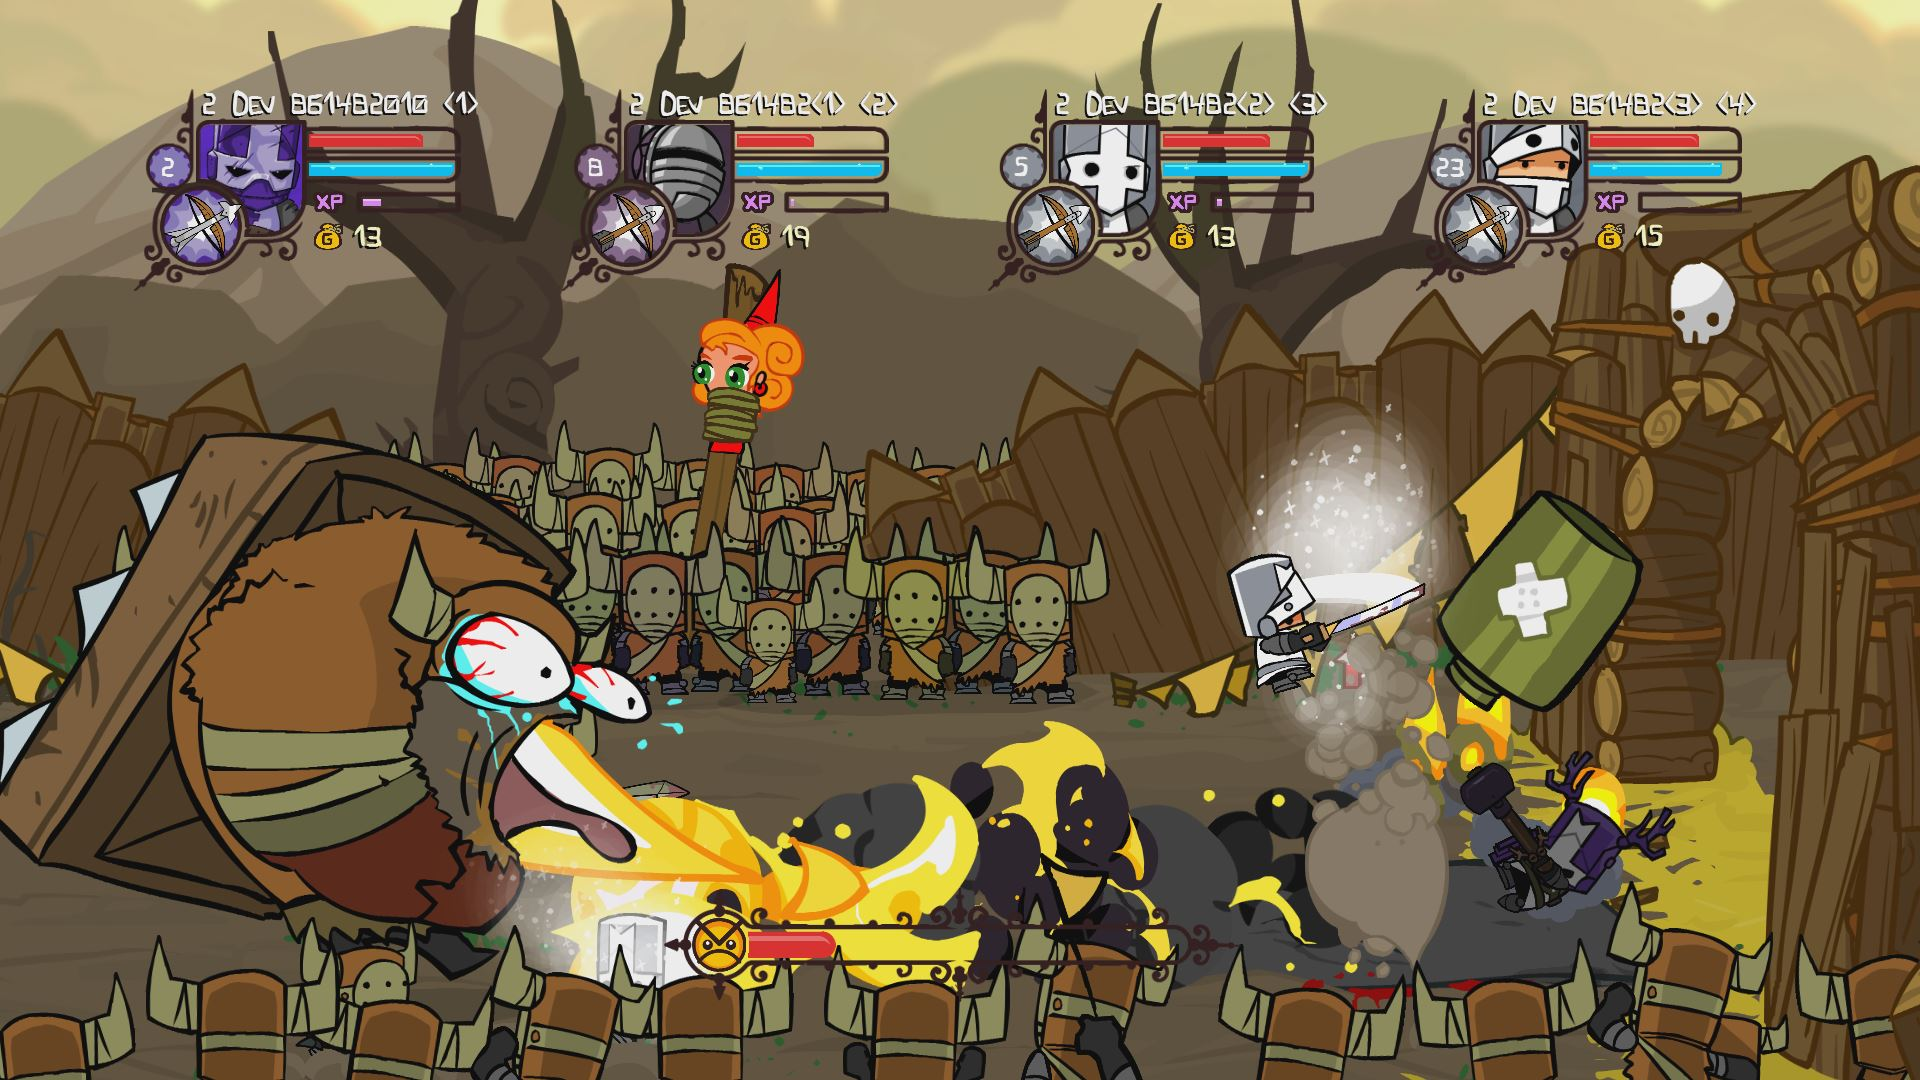 Image jam-packed with zany action showing Castle Crashers Remastered